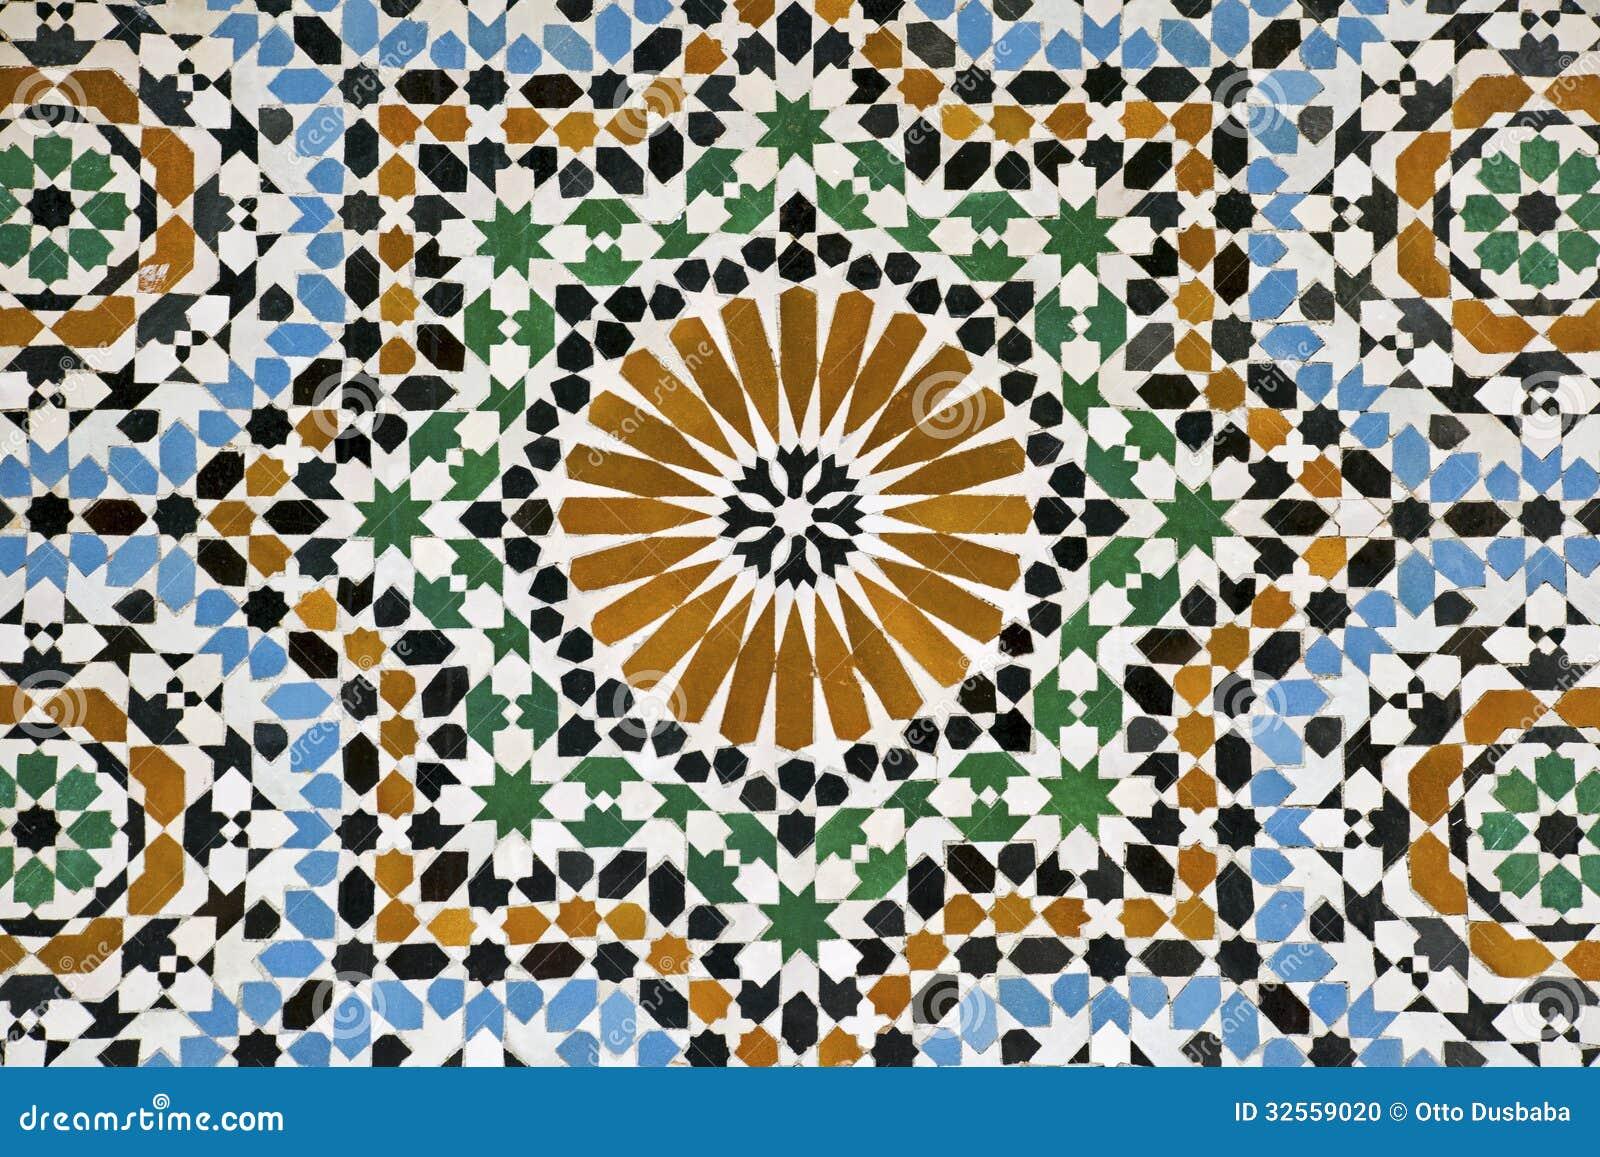 Morrocan mosaic tiles stock photo. Image of decorative - 32559020